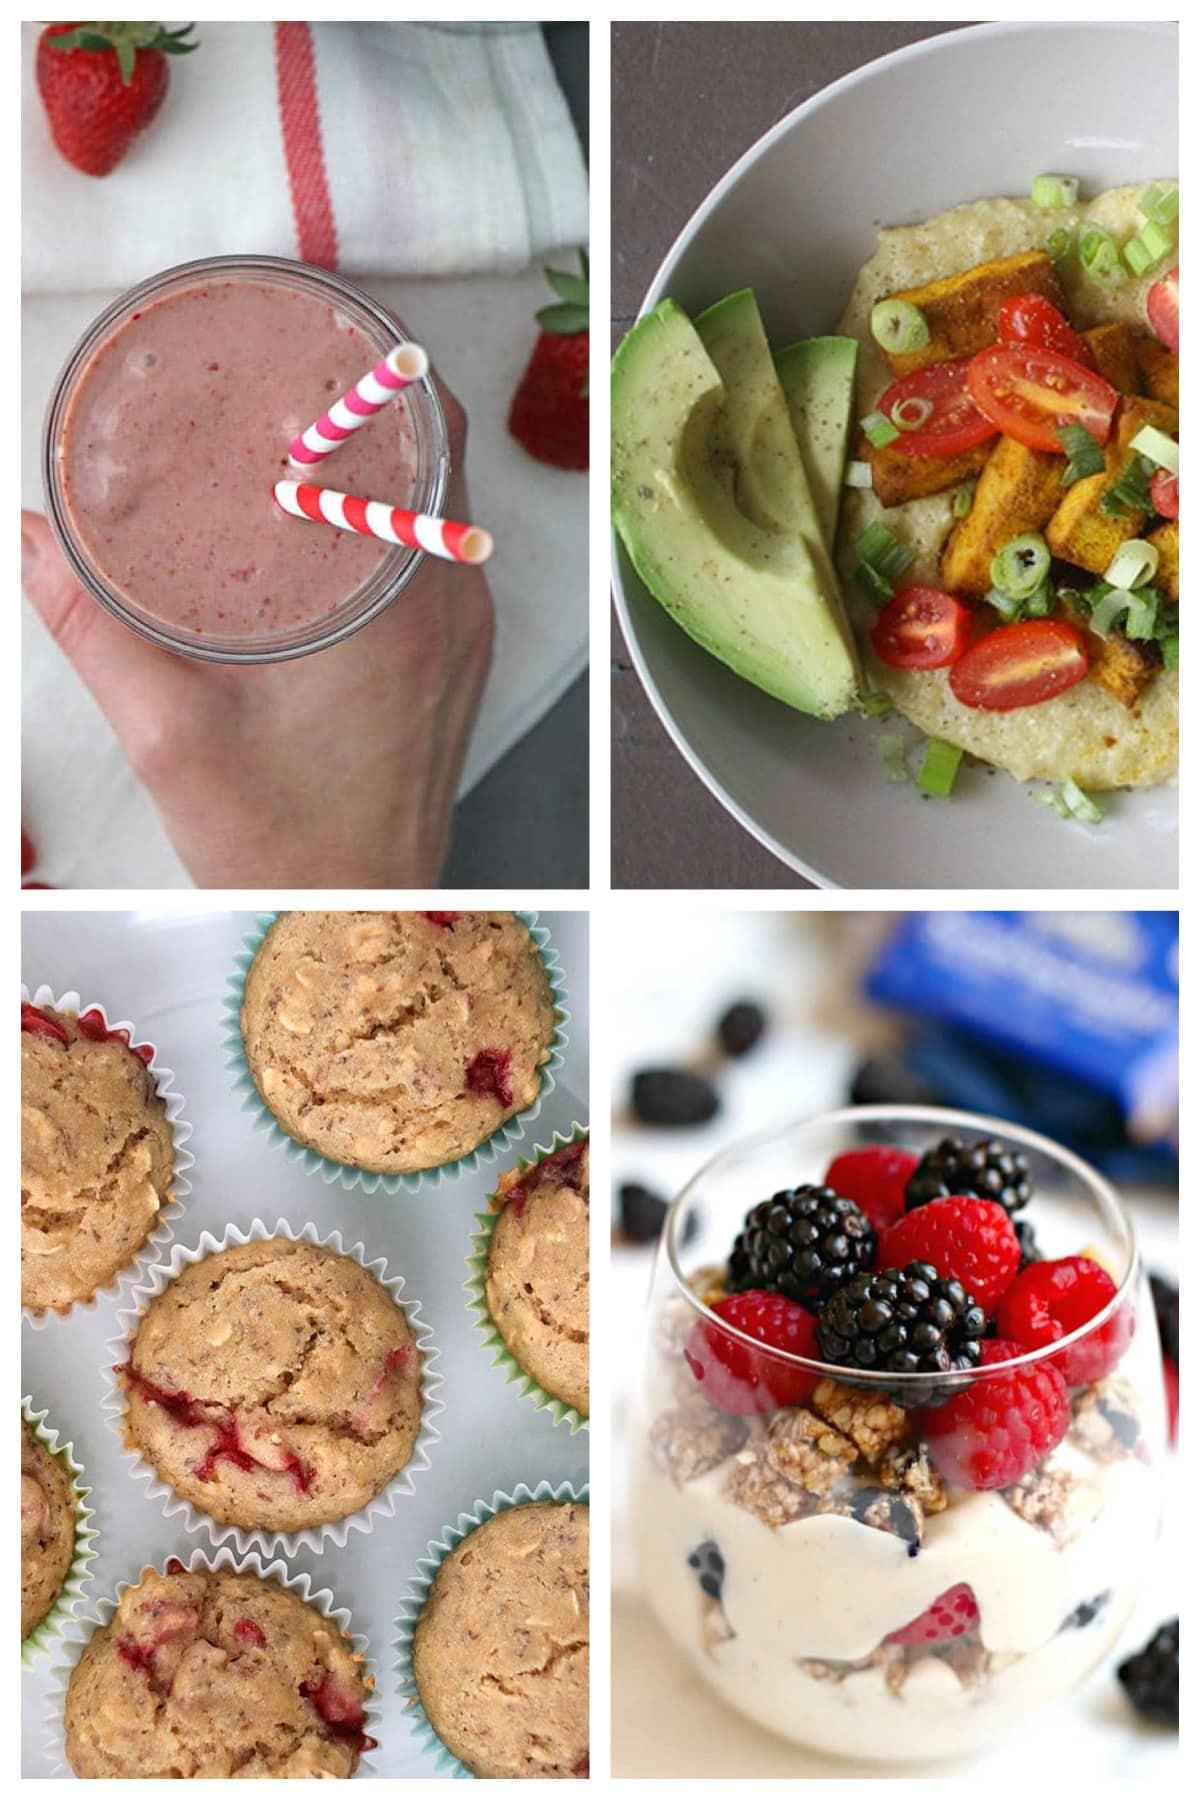 The Easiest Vegan Breakfast Ideas To Kickstart Your Mornings